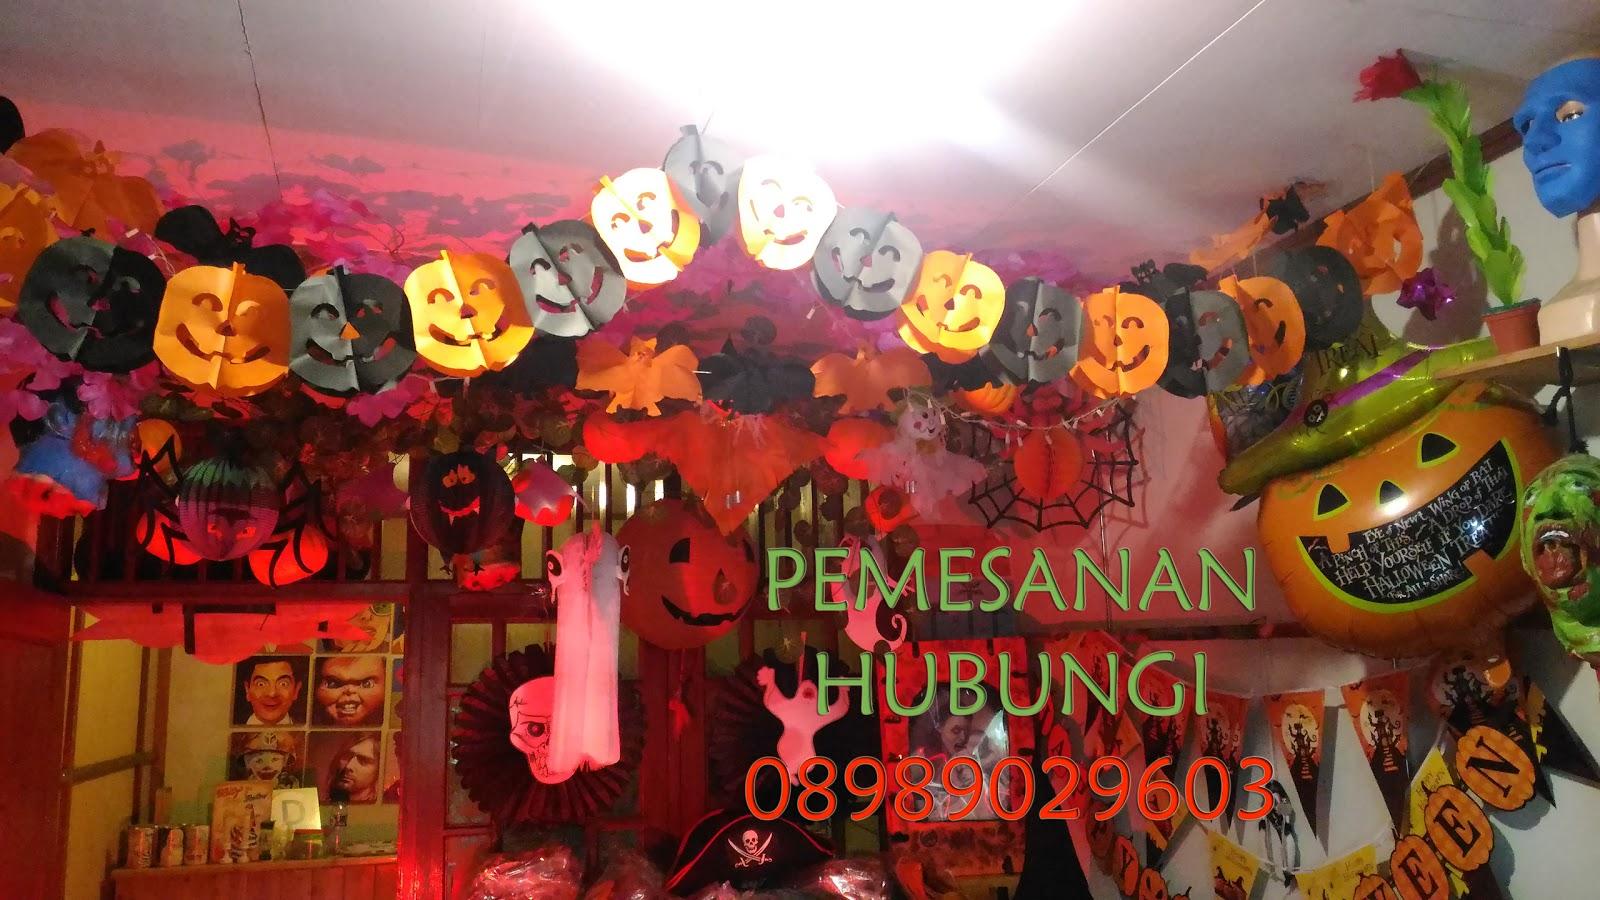 Toko Yang Jual Hiasan Halloween Pusat Topeng Murah Jakarta